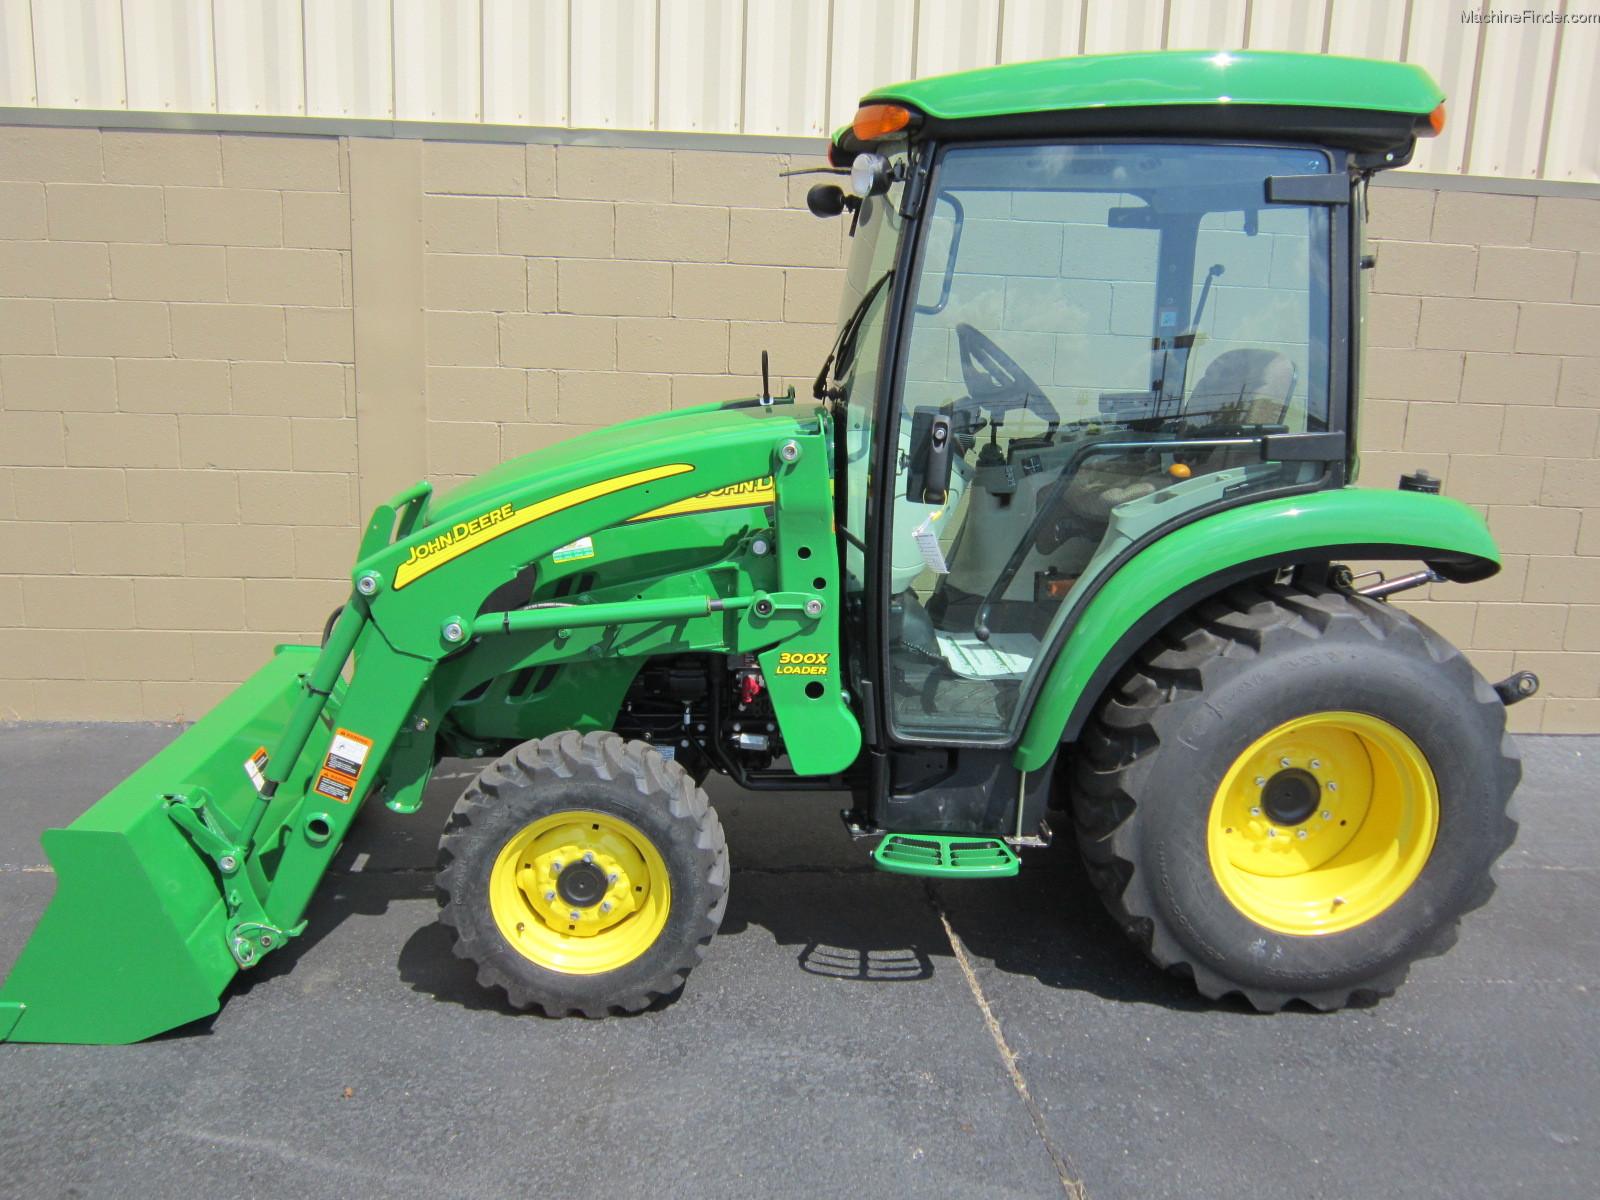 2012 John Deere 3320 Tractors - Compact (1-40hp.) - John ...